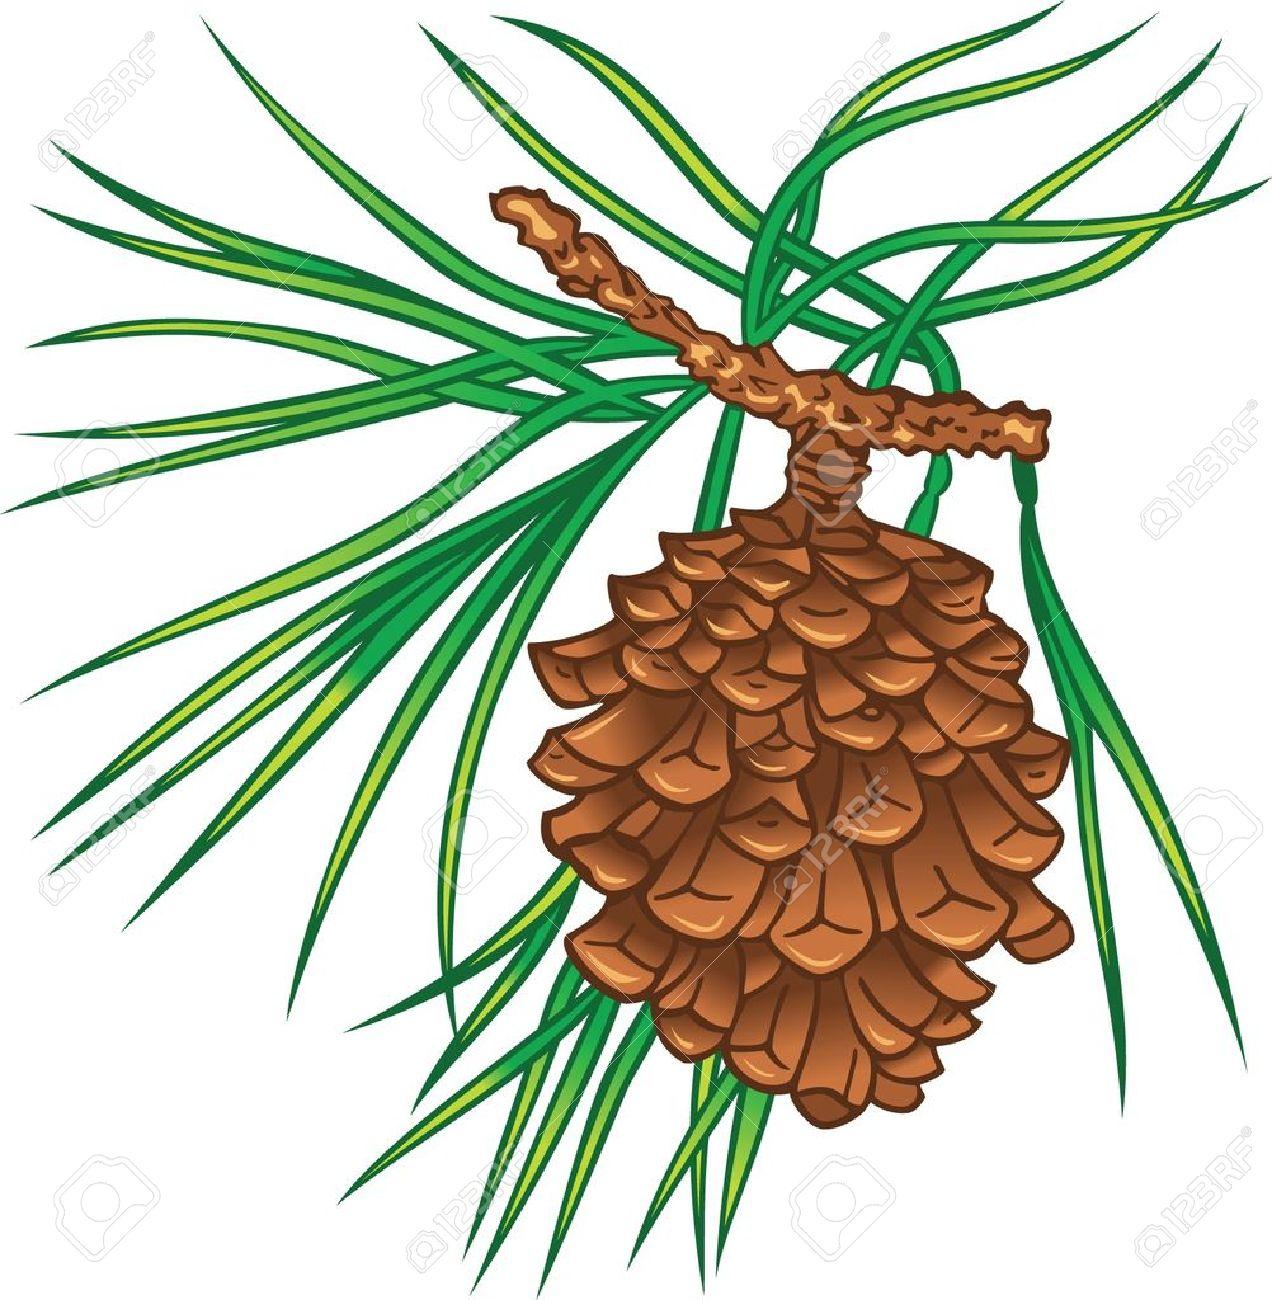 Pine tree needles clipart #10